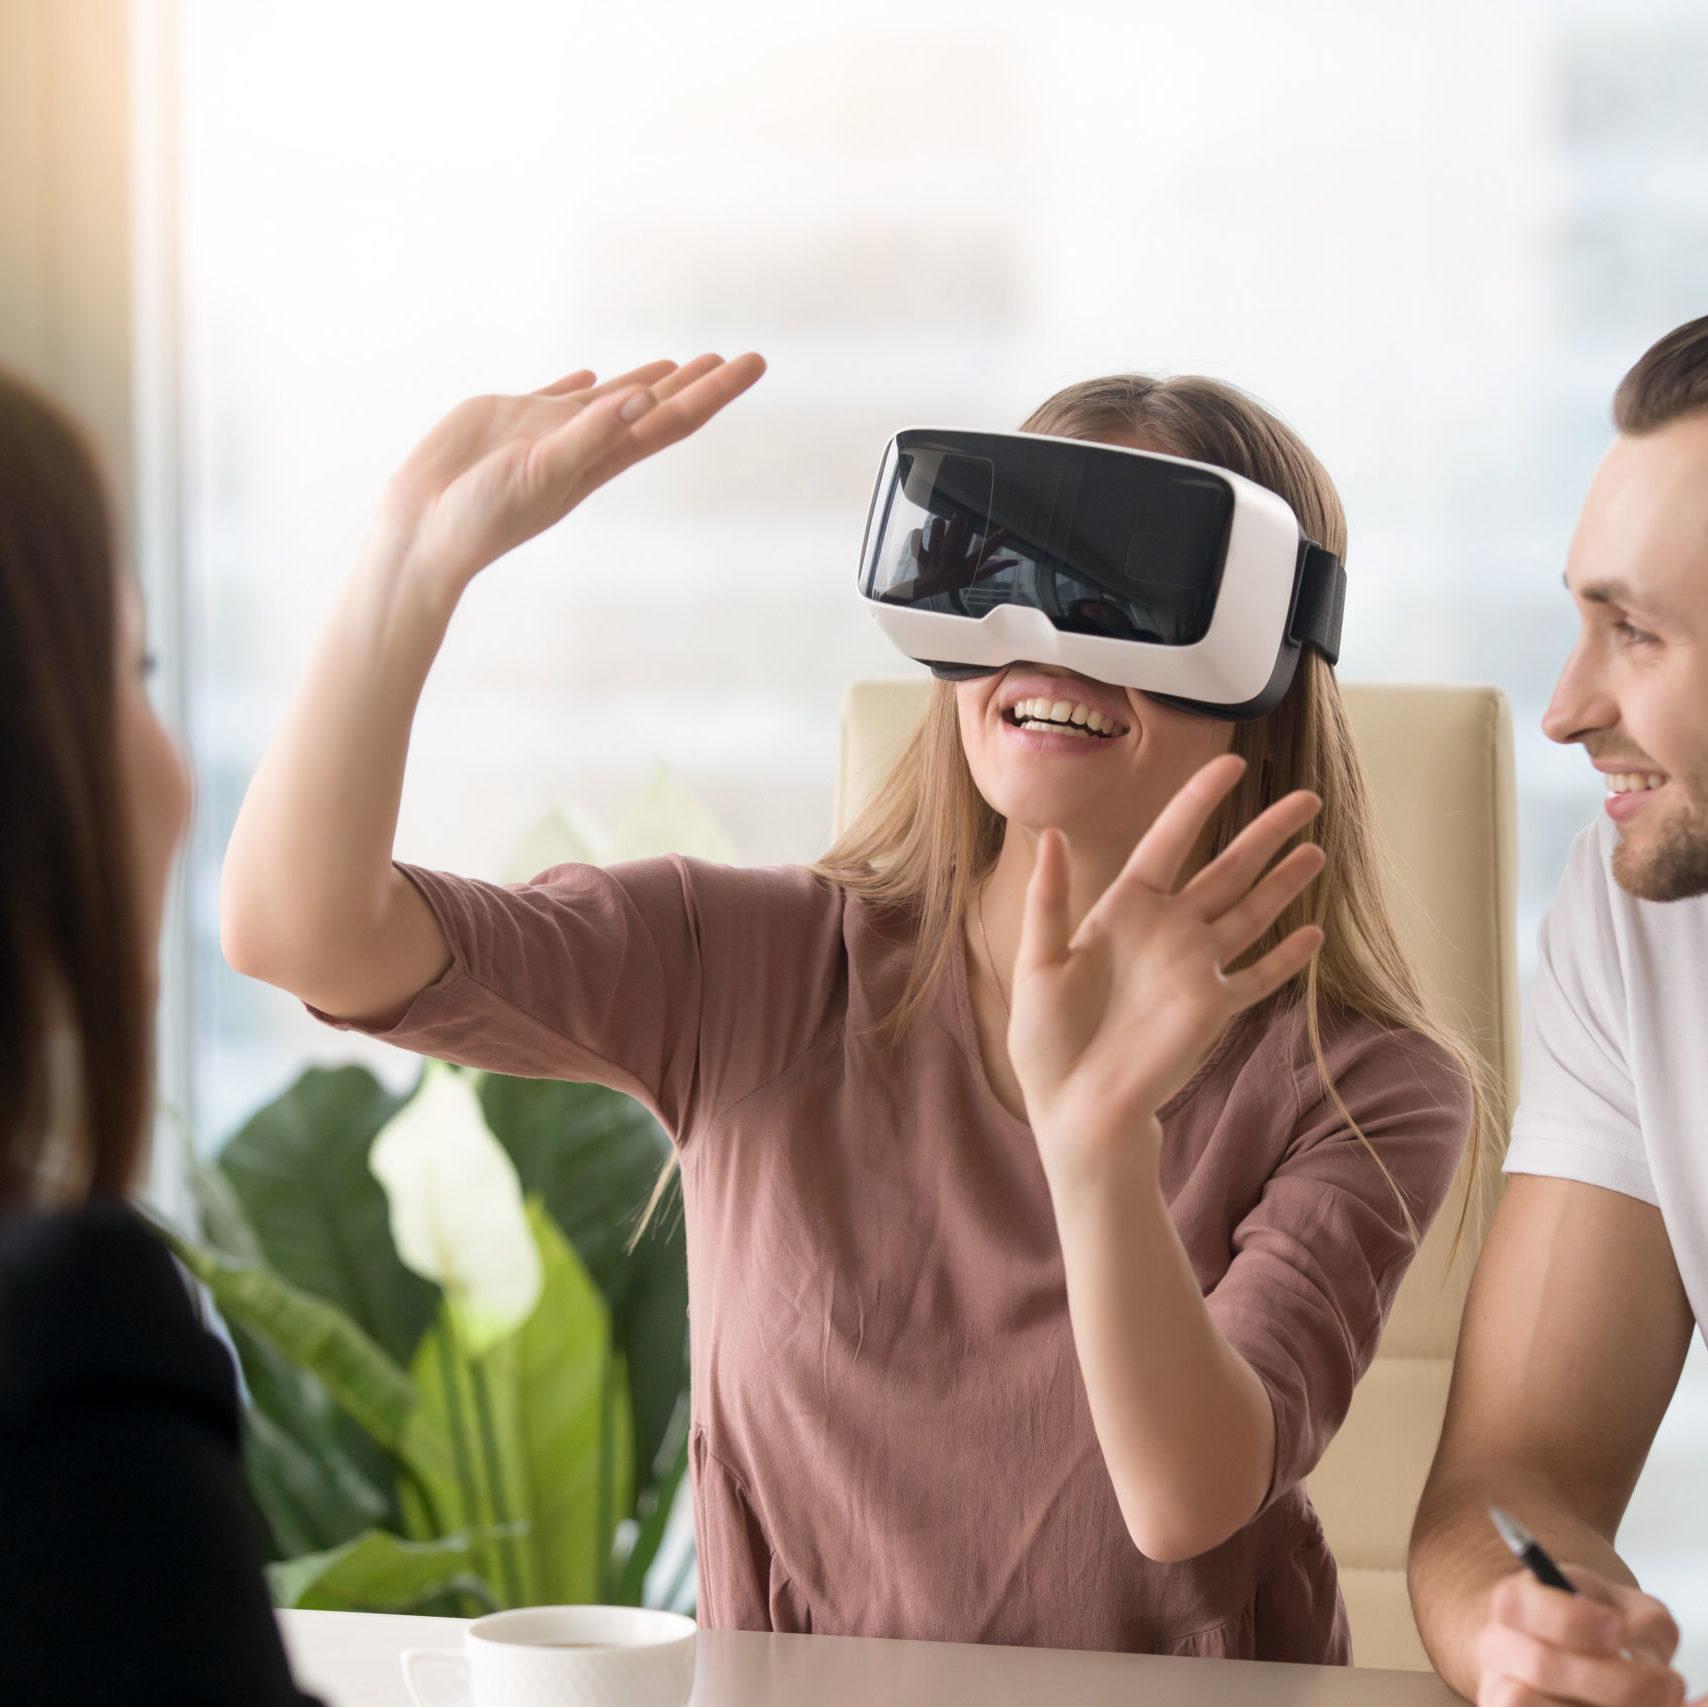 Woman wearing virtual reality headset, team developing VR glasse